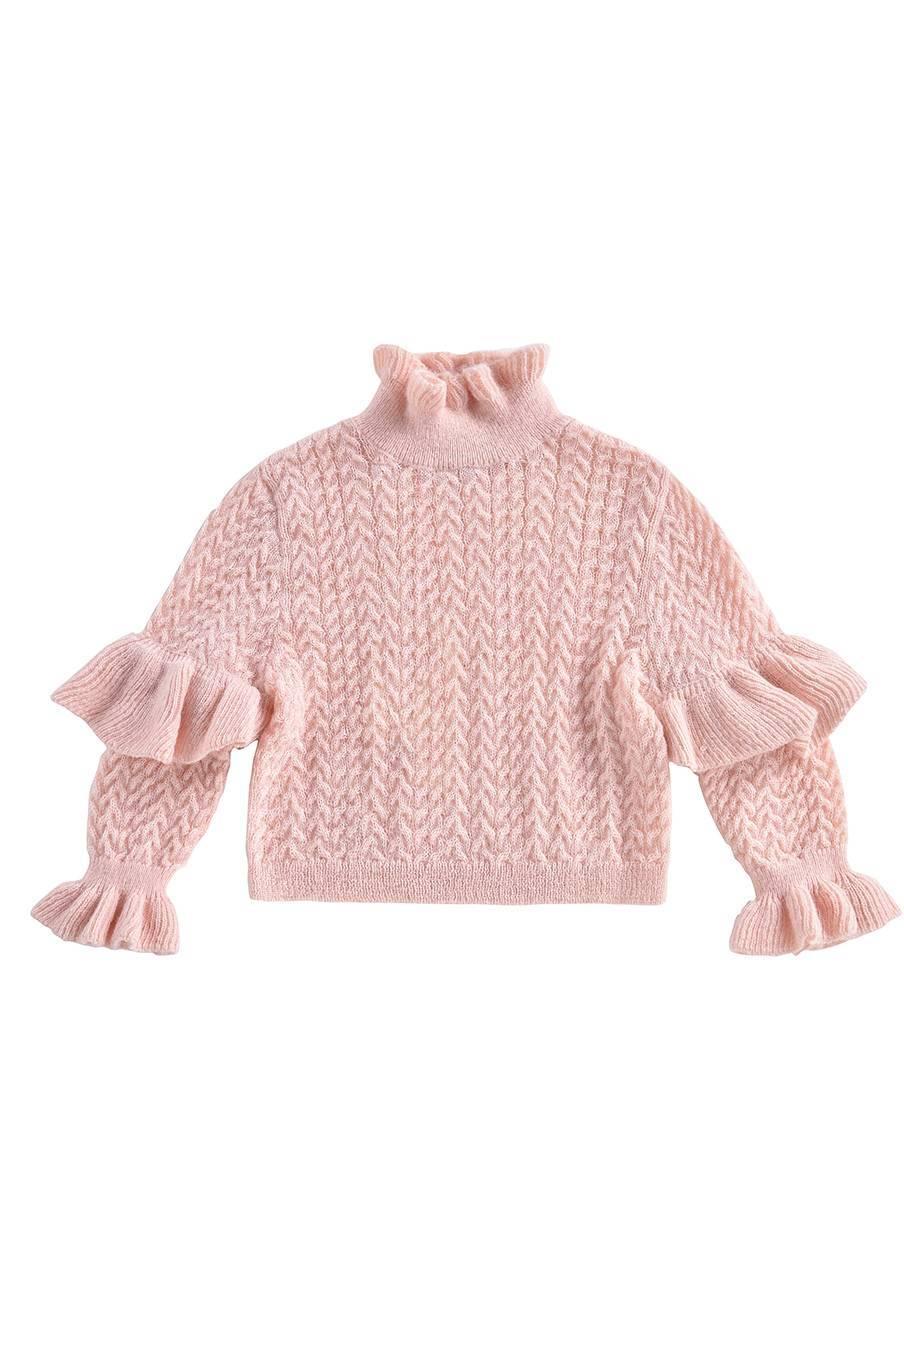 boheme chic vintage pull bébé fille jevo blush